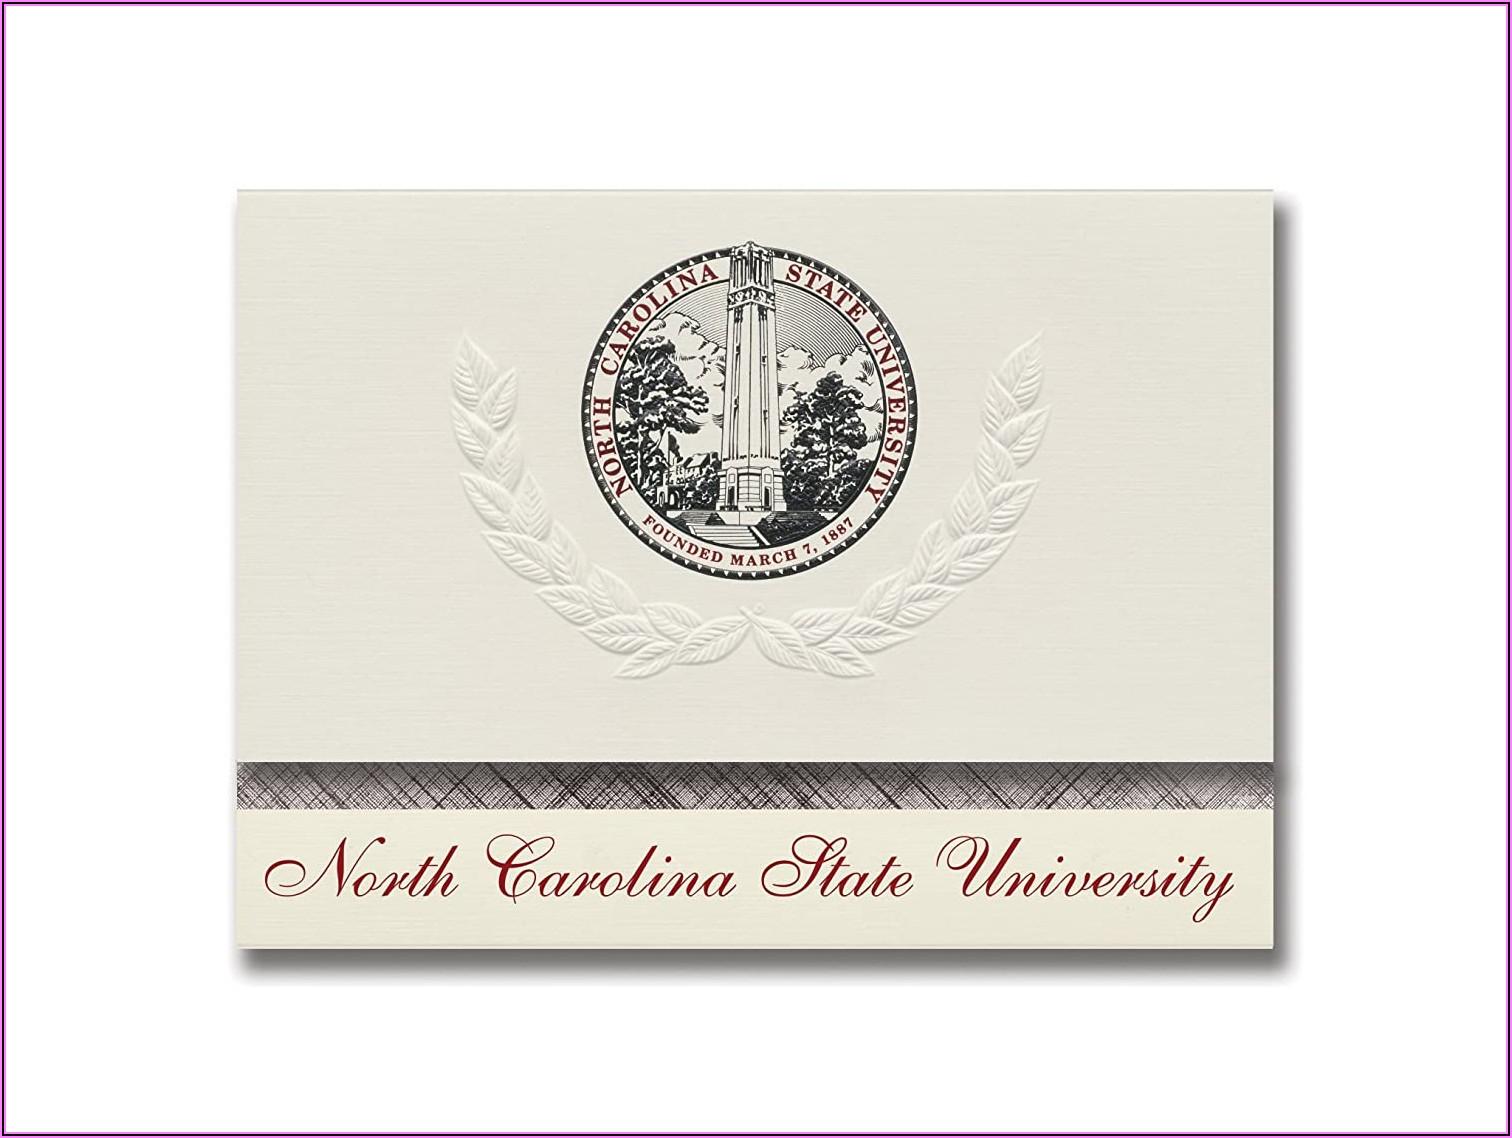 North Carolina State University Graduation Announcements